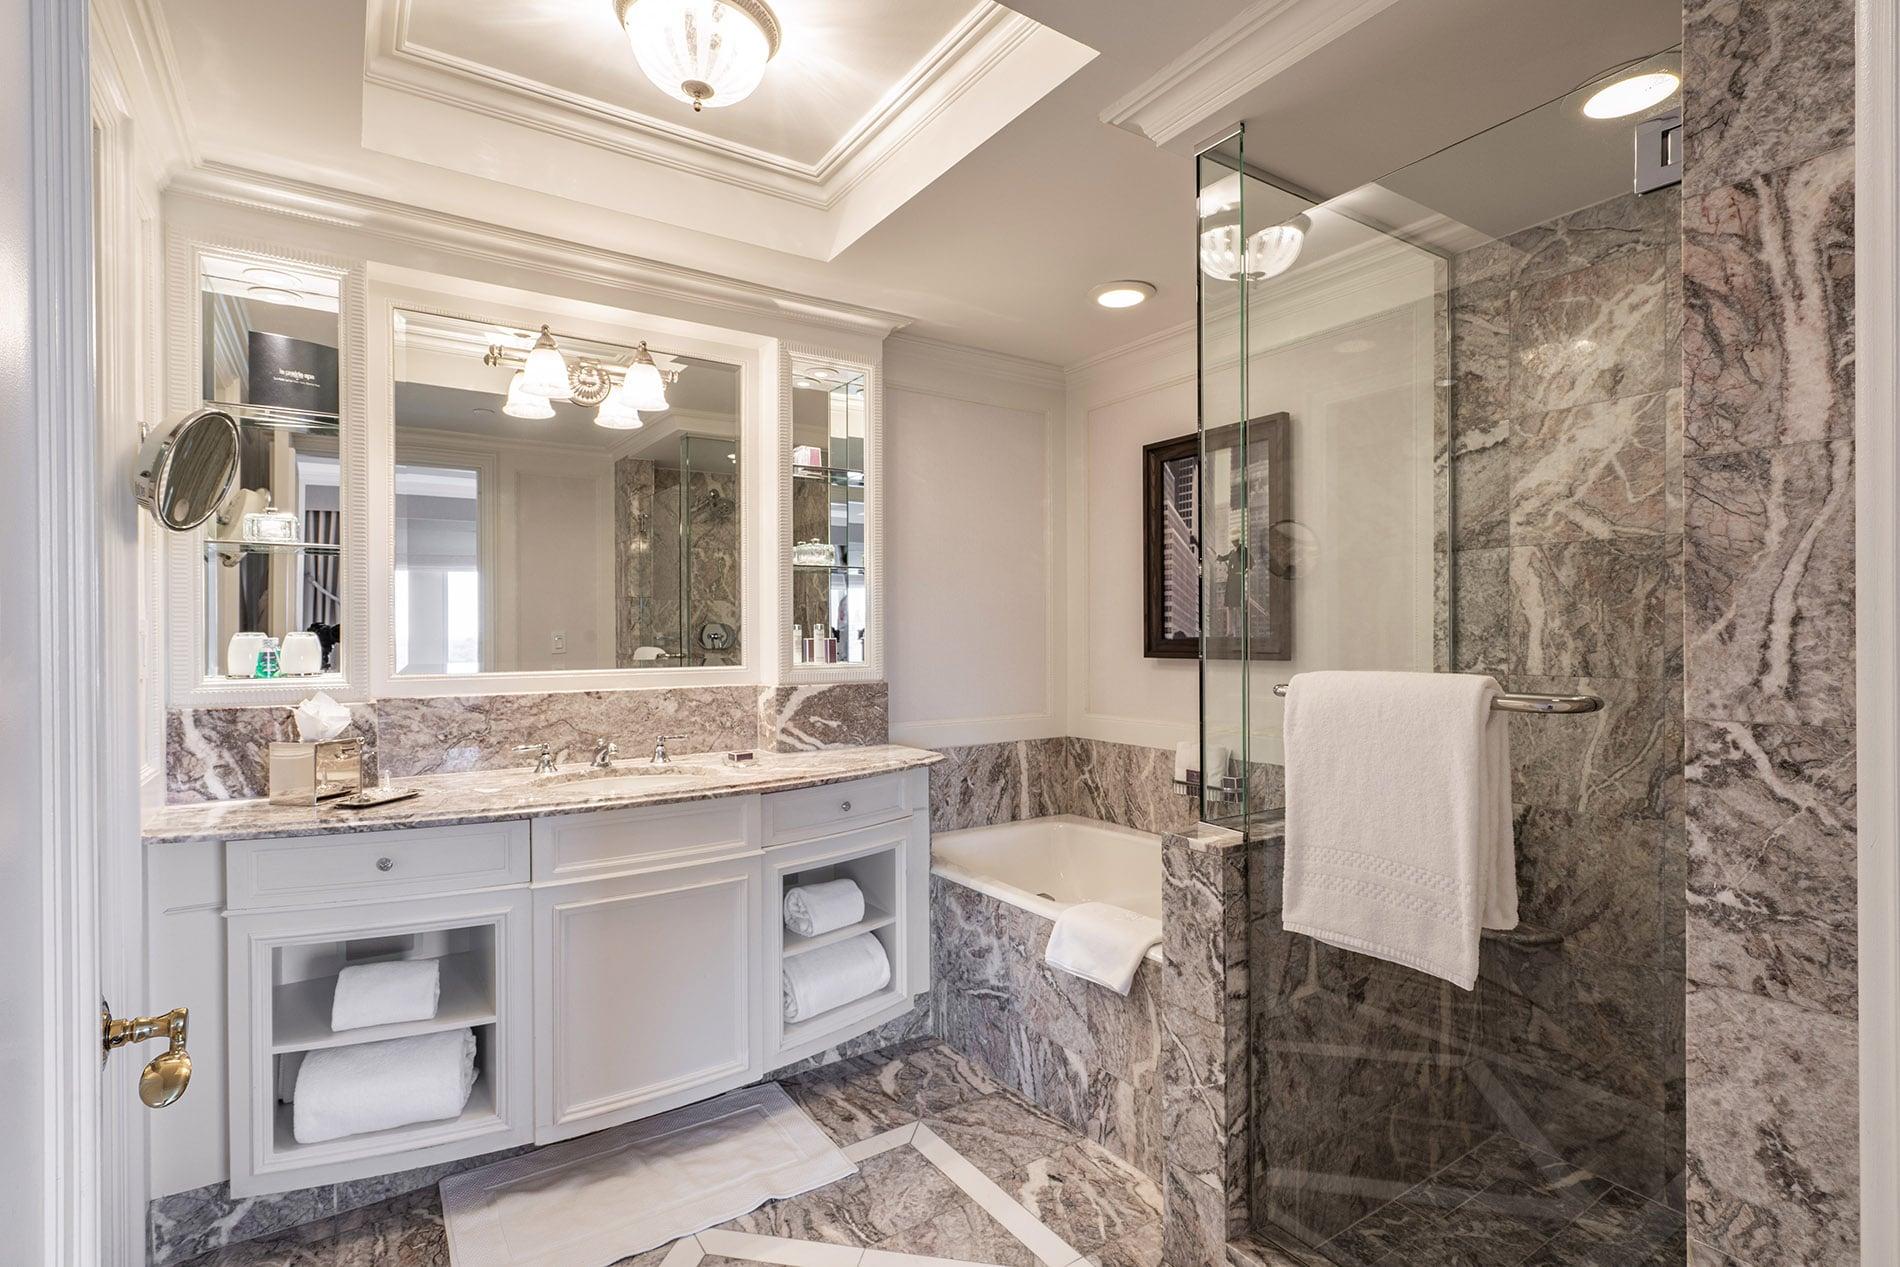 Ritz-Carlton New York Central Park, bathroom 1